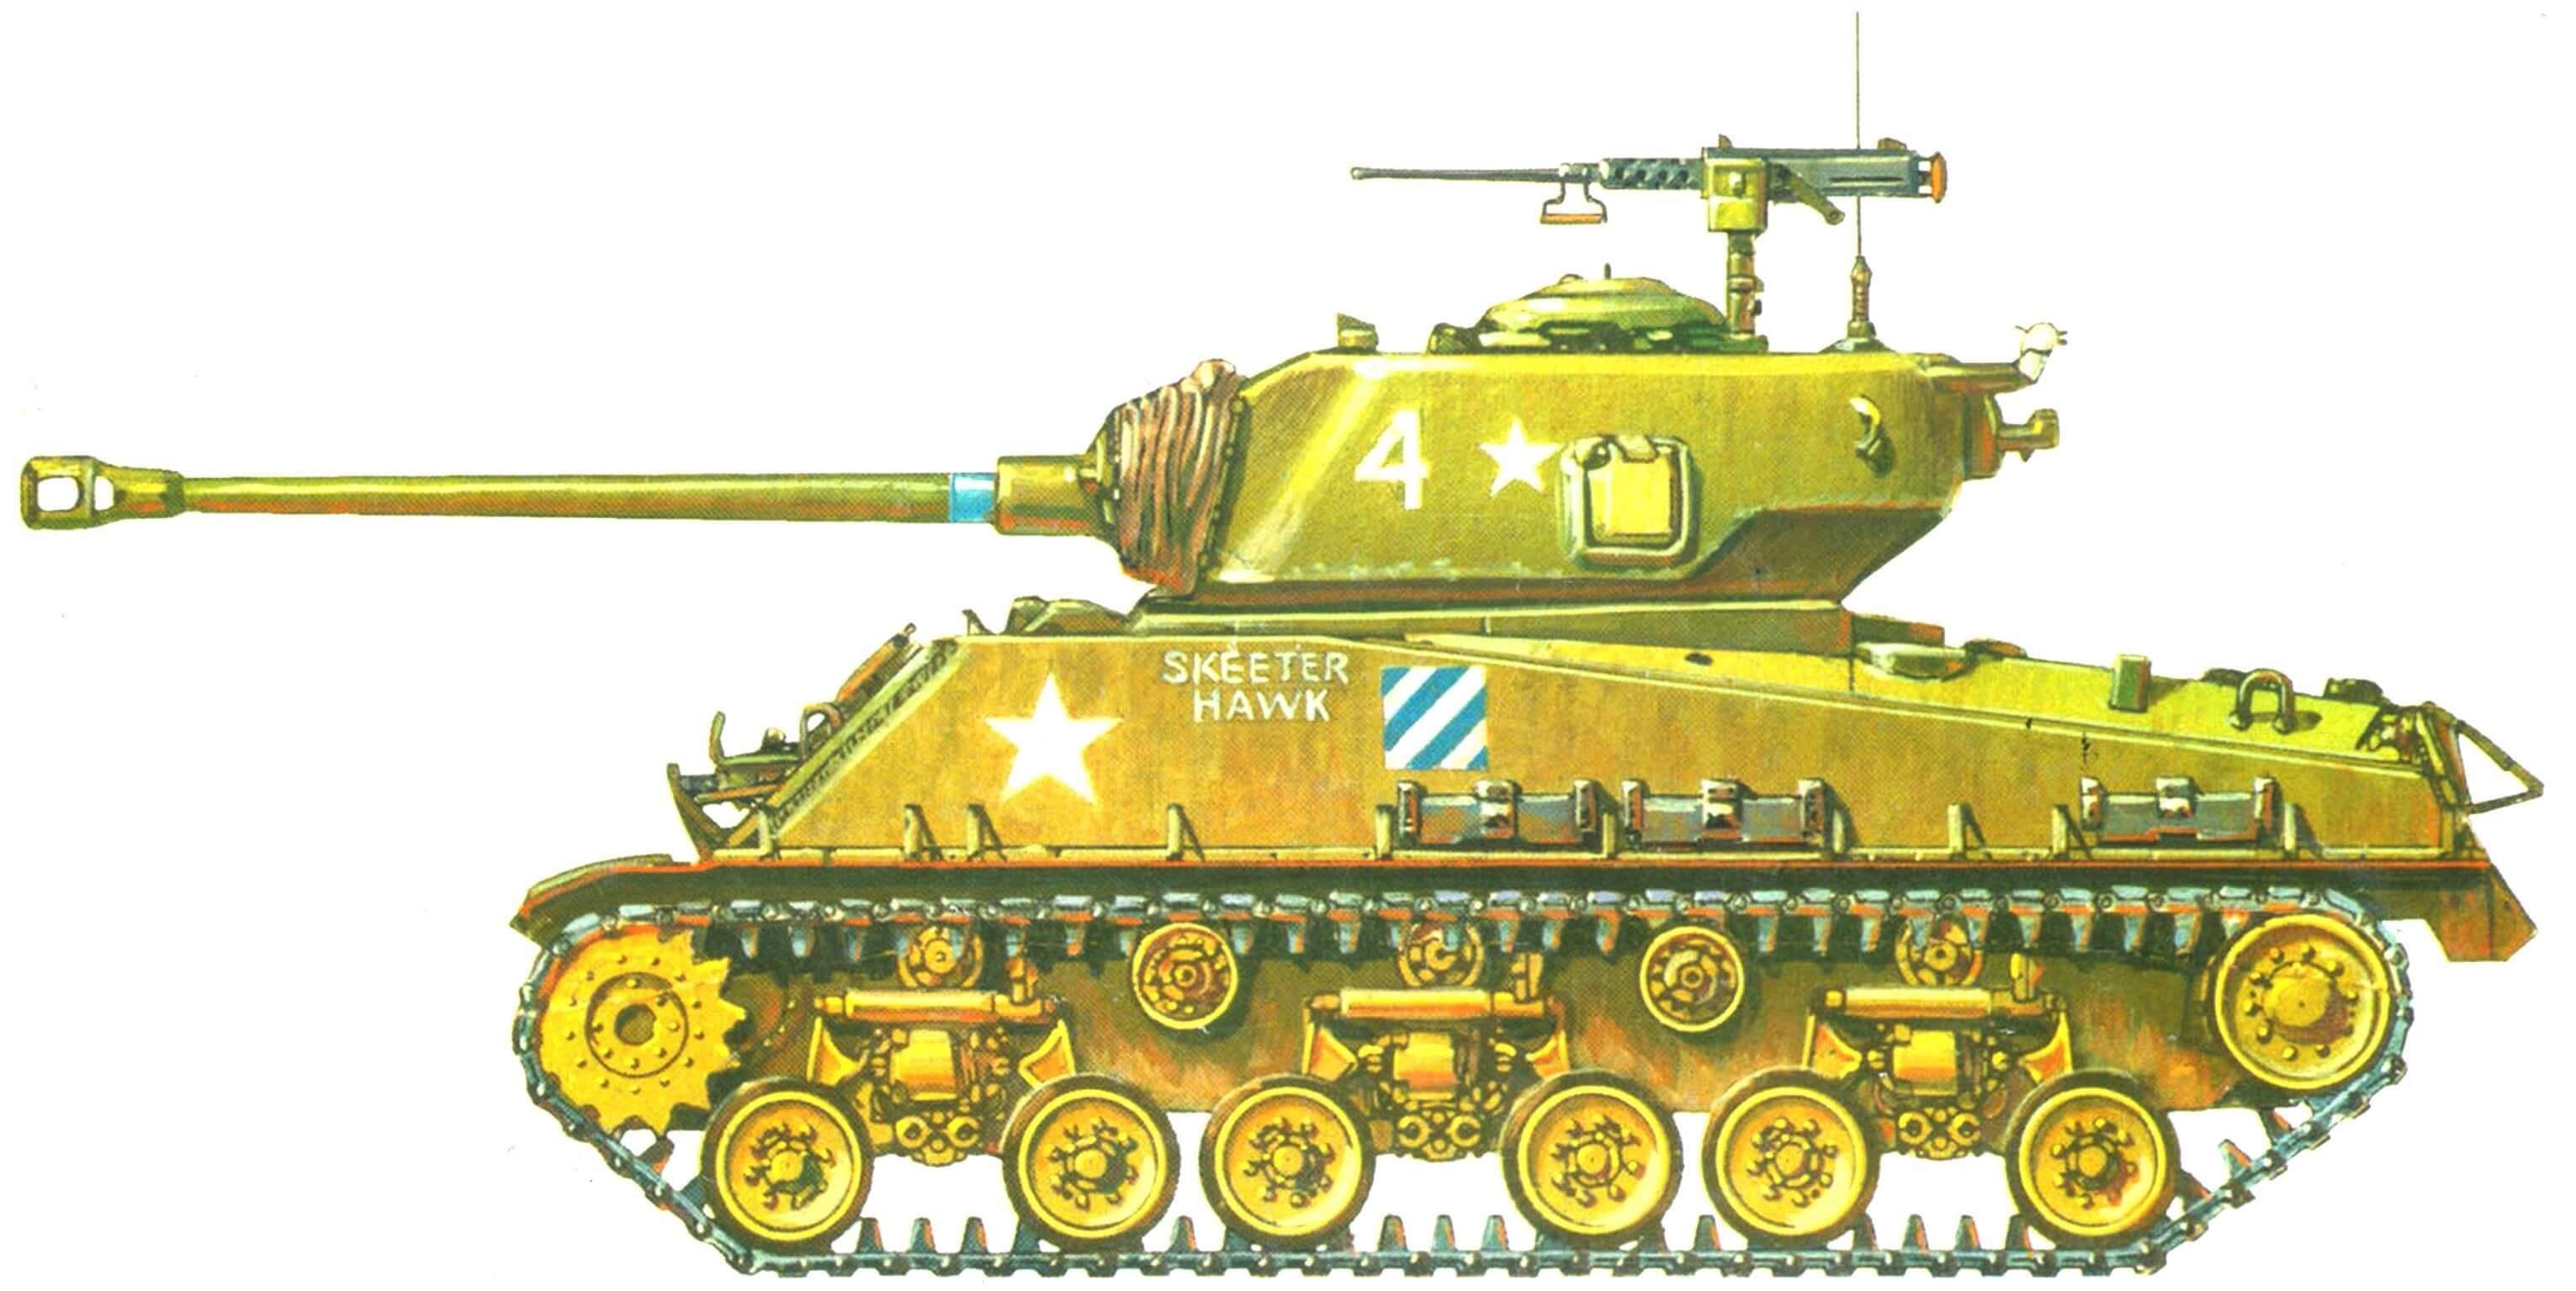 Средний танк М4АЗЕ8. 64-й танковый батальон армии США, Корея, февраль 1951 г.